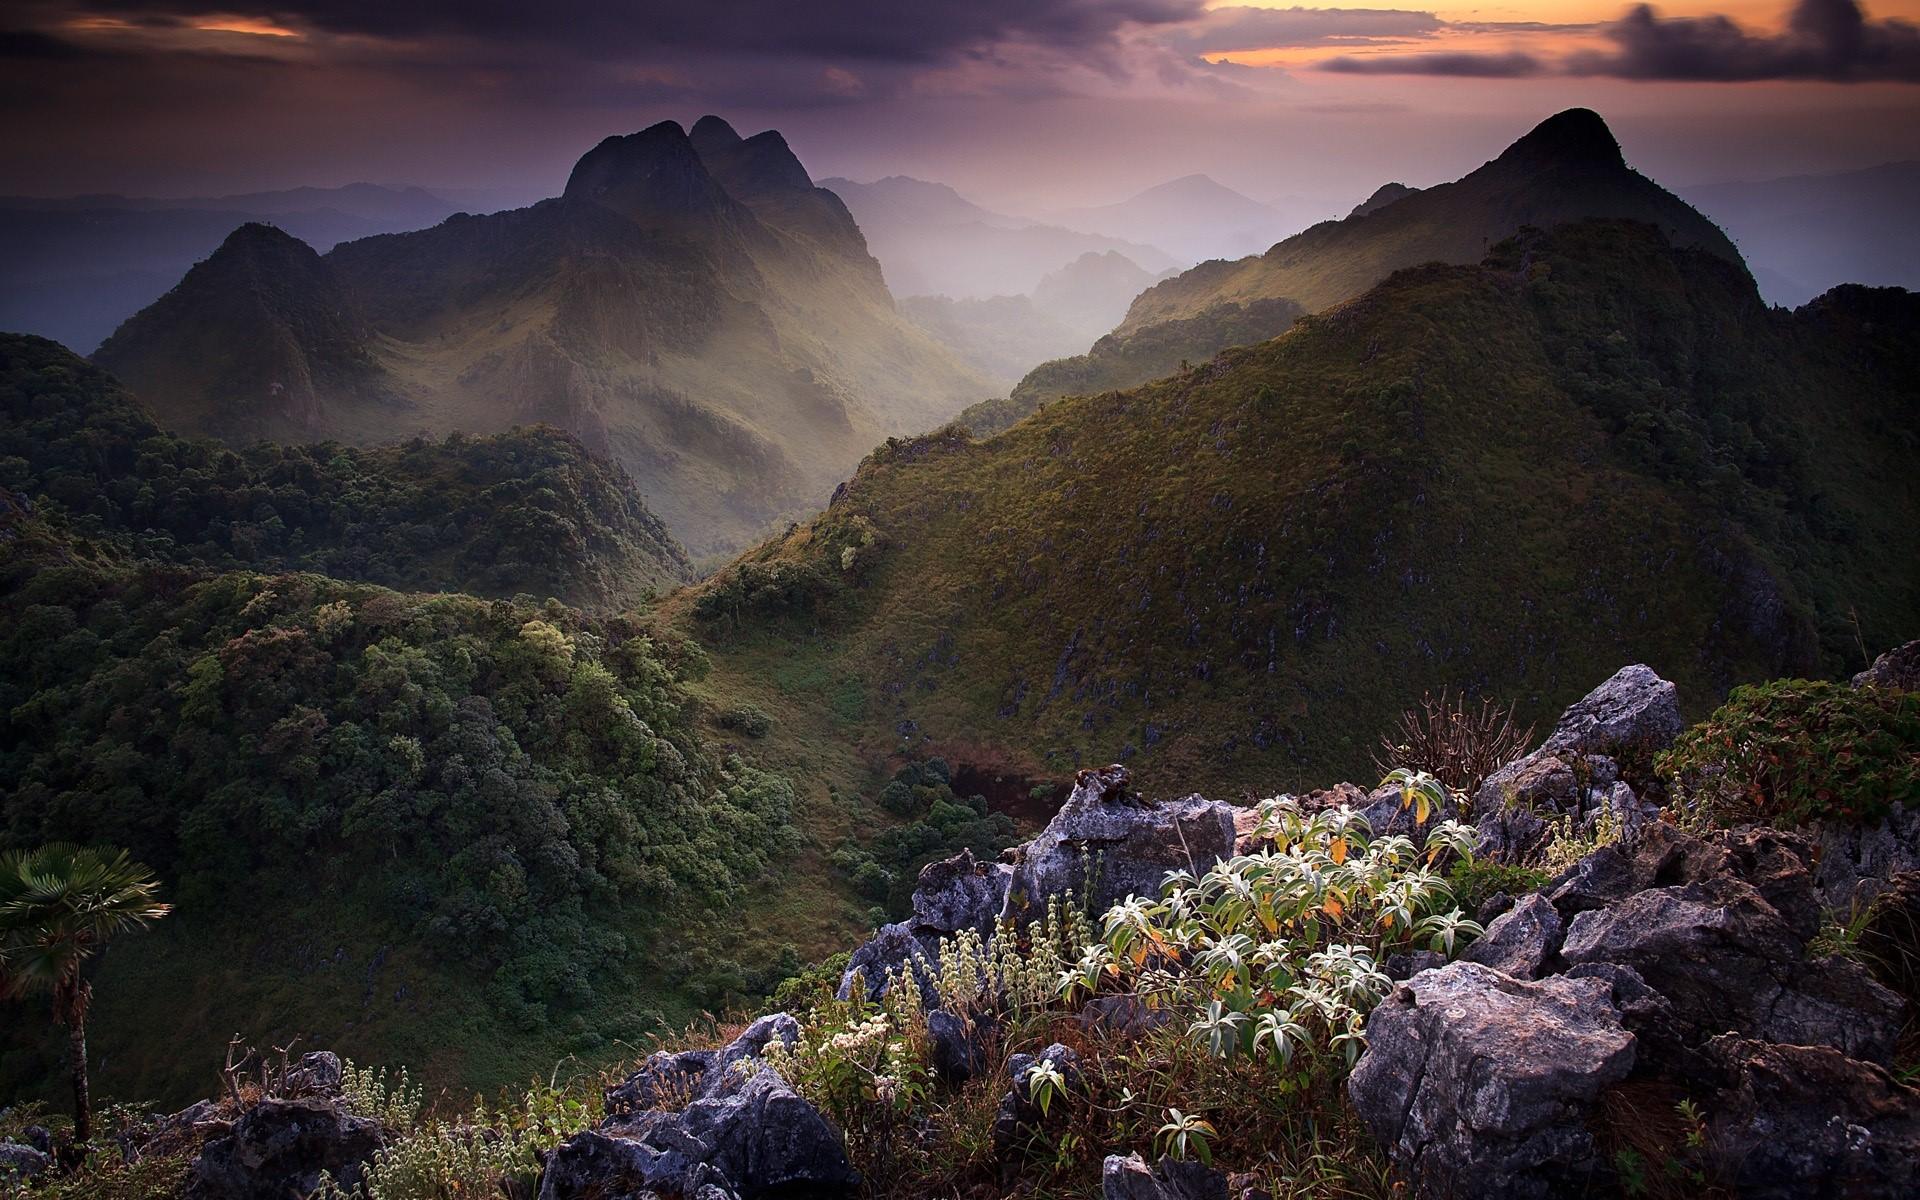 Wallpaper Limestone Mountain in Thailand